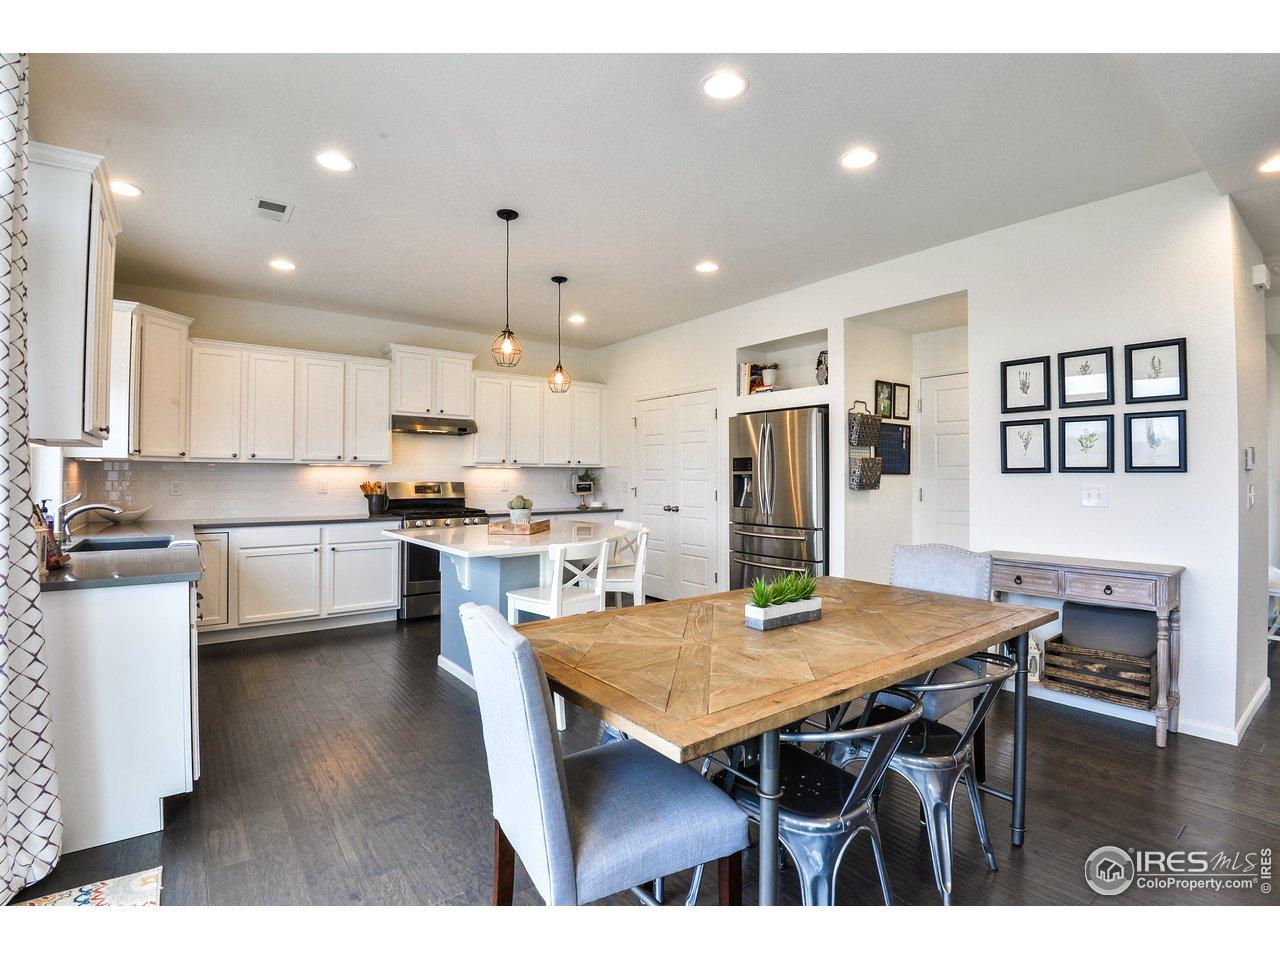 Large Bright Kitchen, Quarts Counters